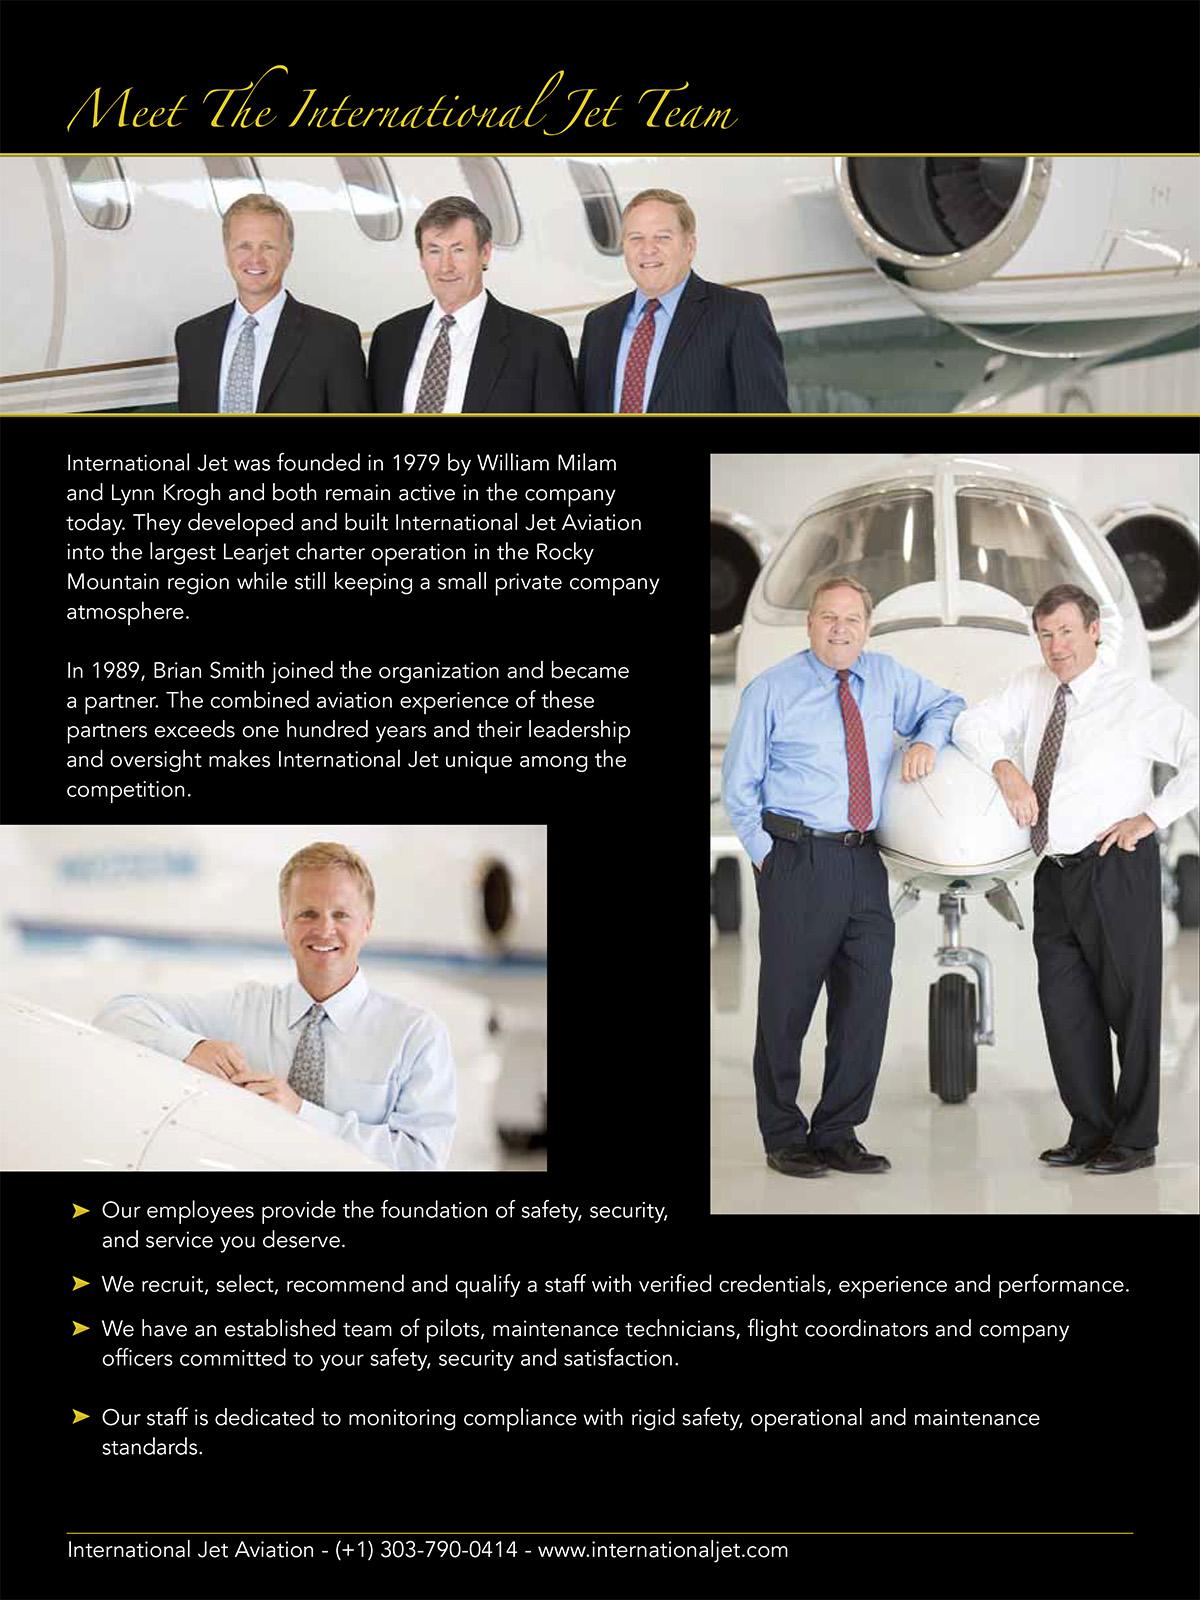 Client: International Jet